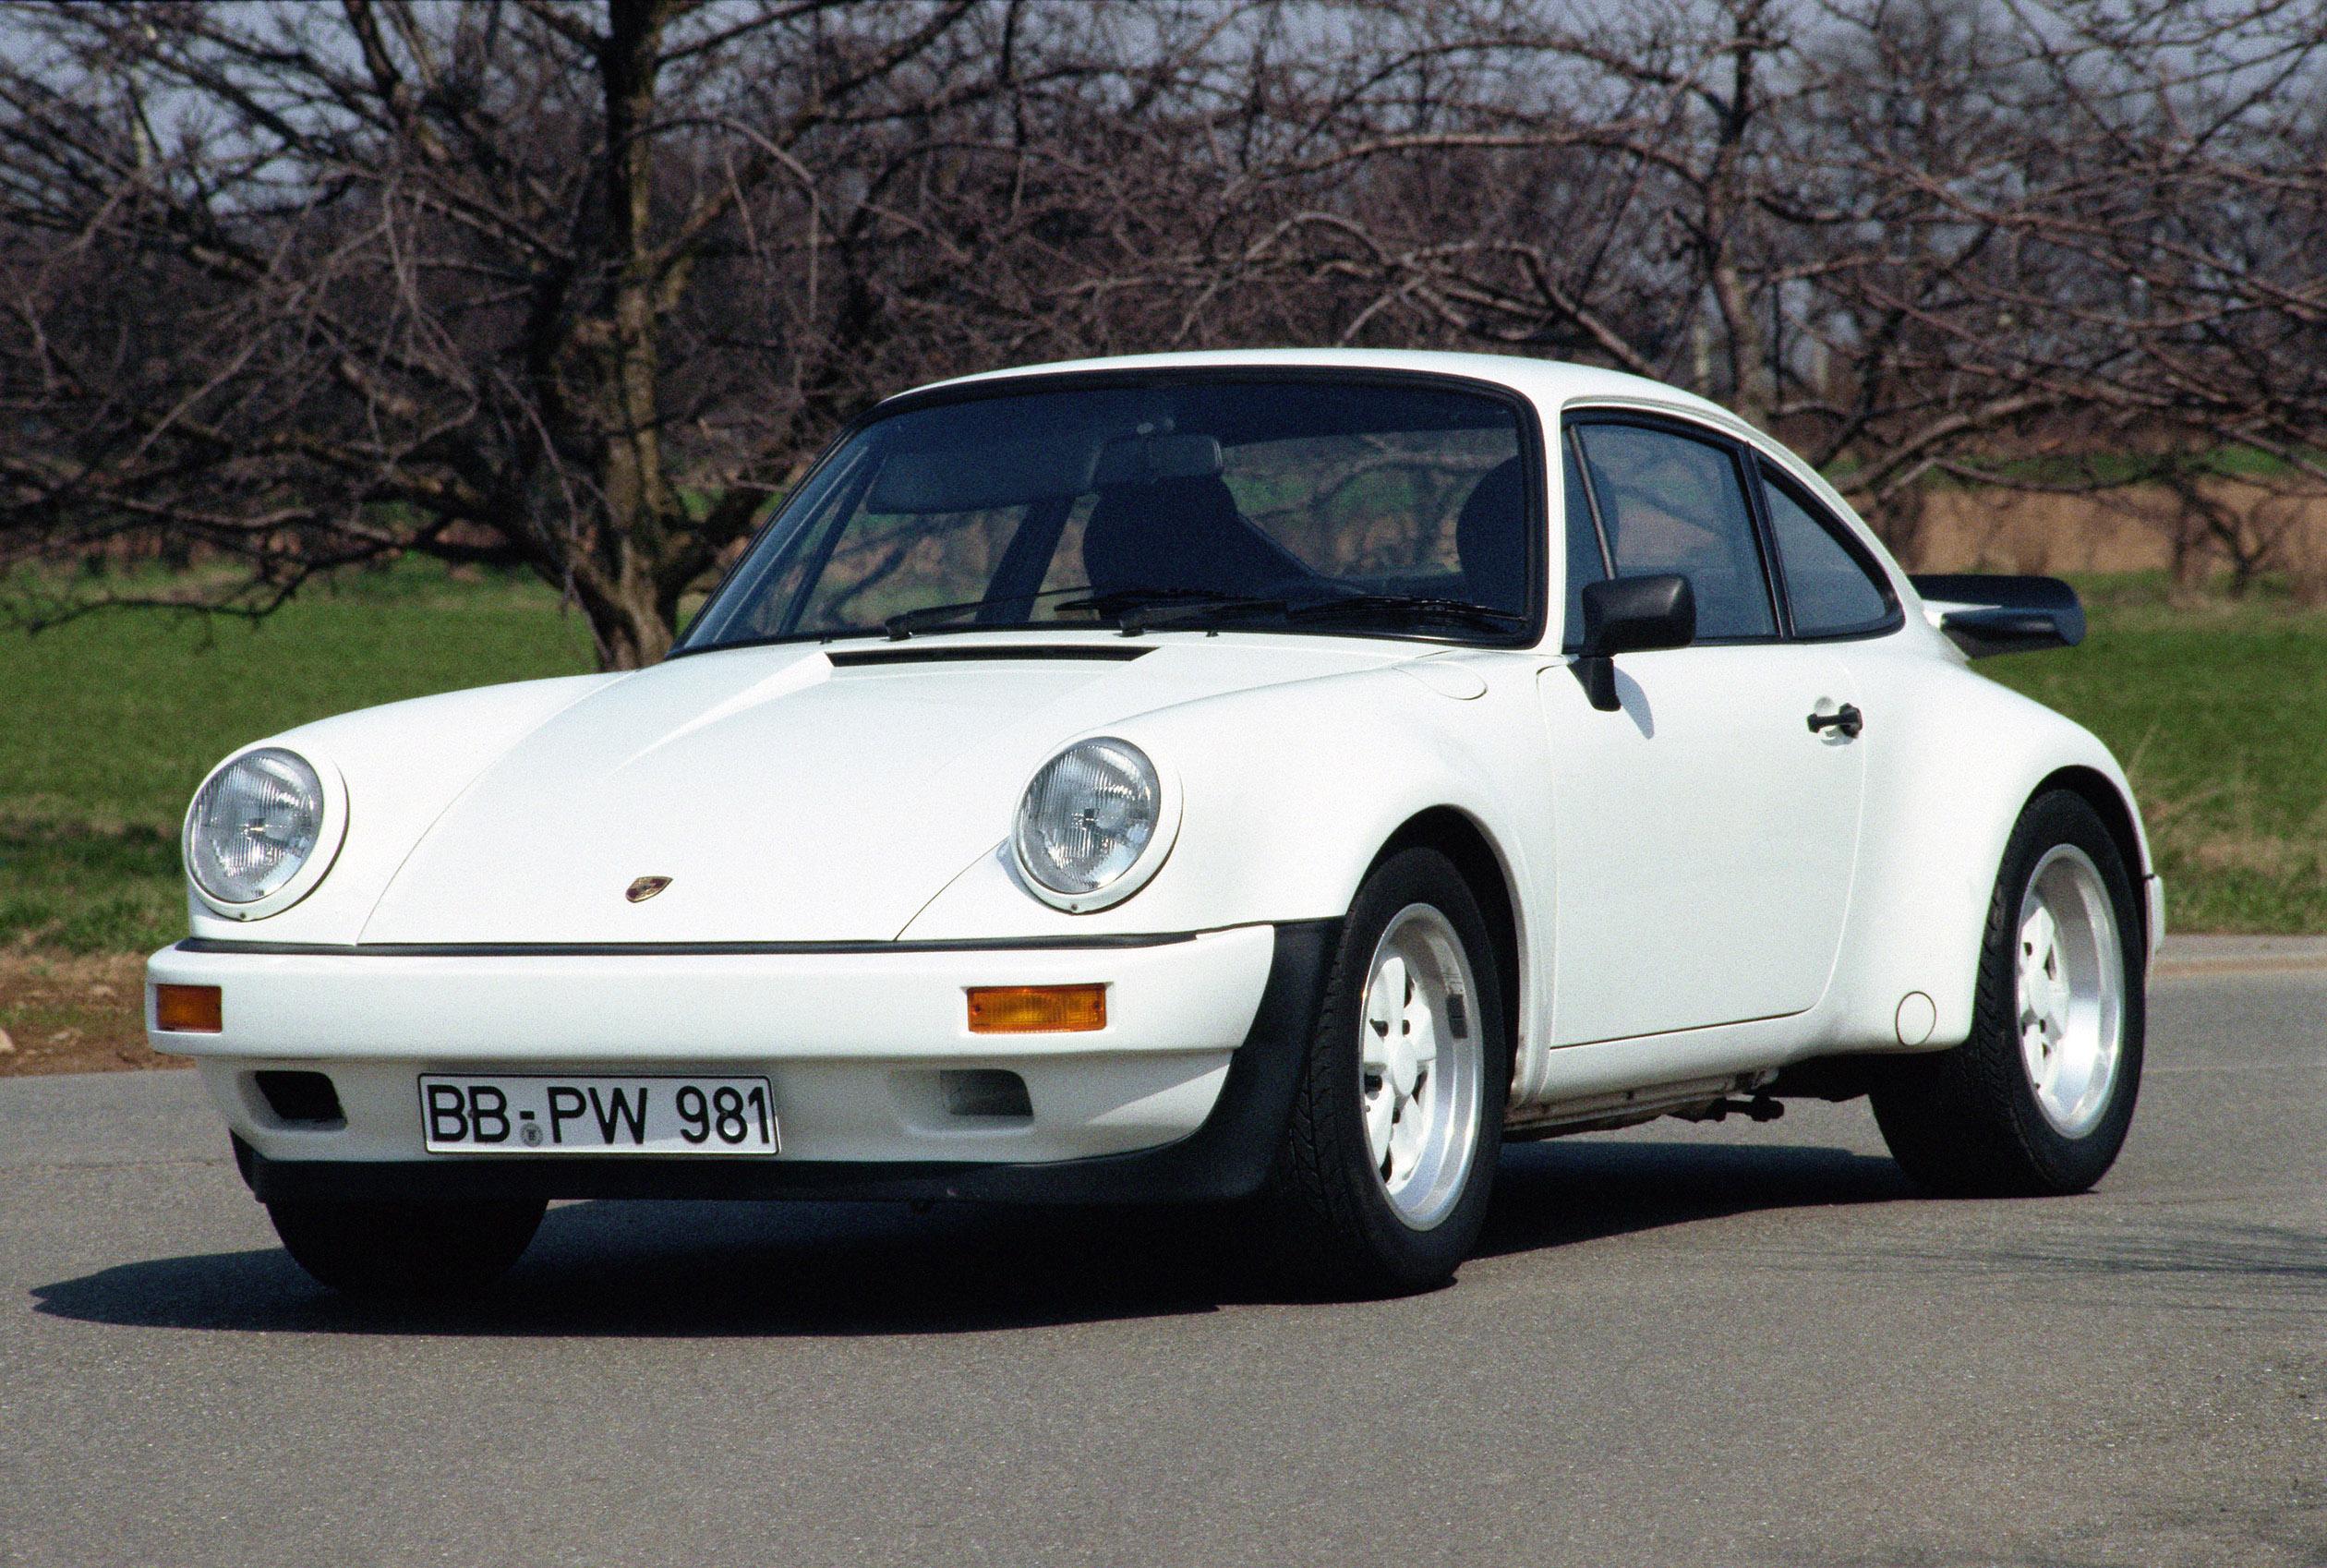 1984 Porsche 911 SC RS | Porsche | SuperCars.net